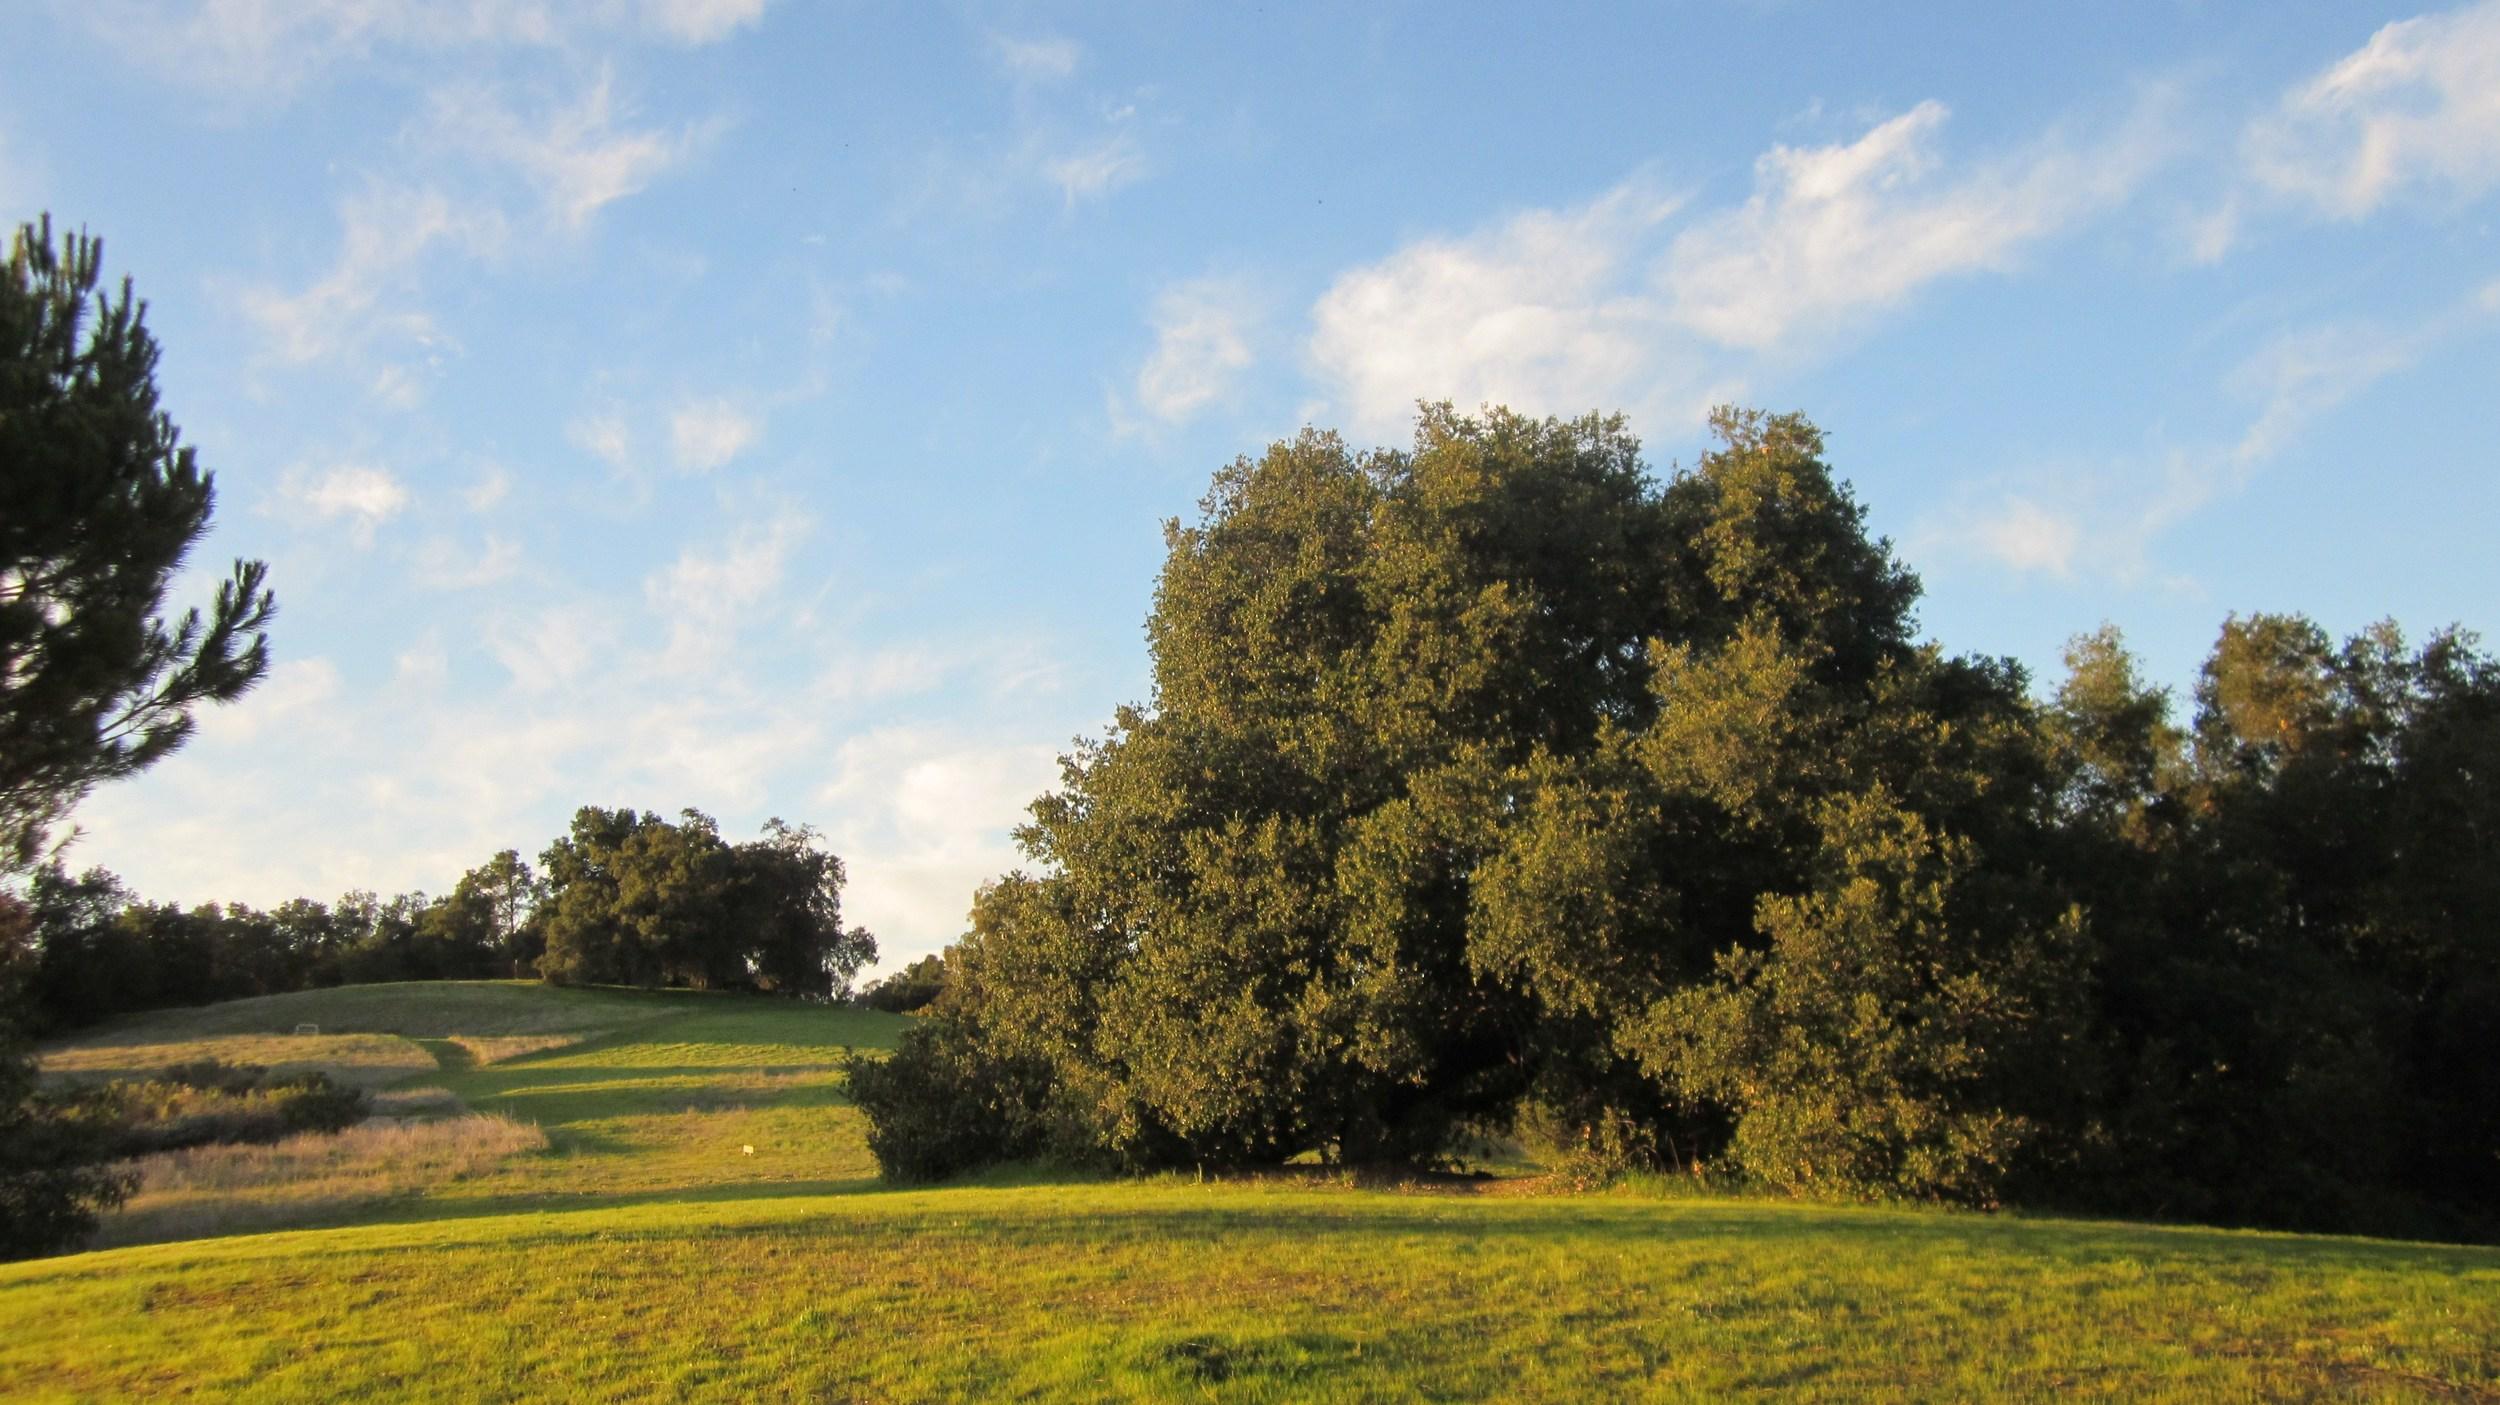 BABA'S TREE viewed from Avatar's Point. (Wayne Myers photo, 2013.)